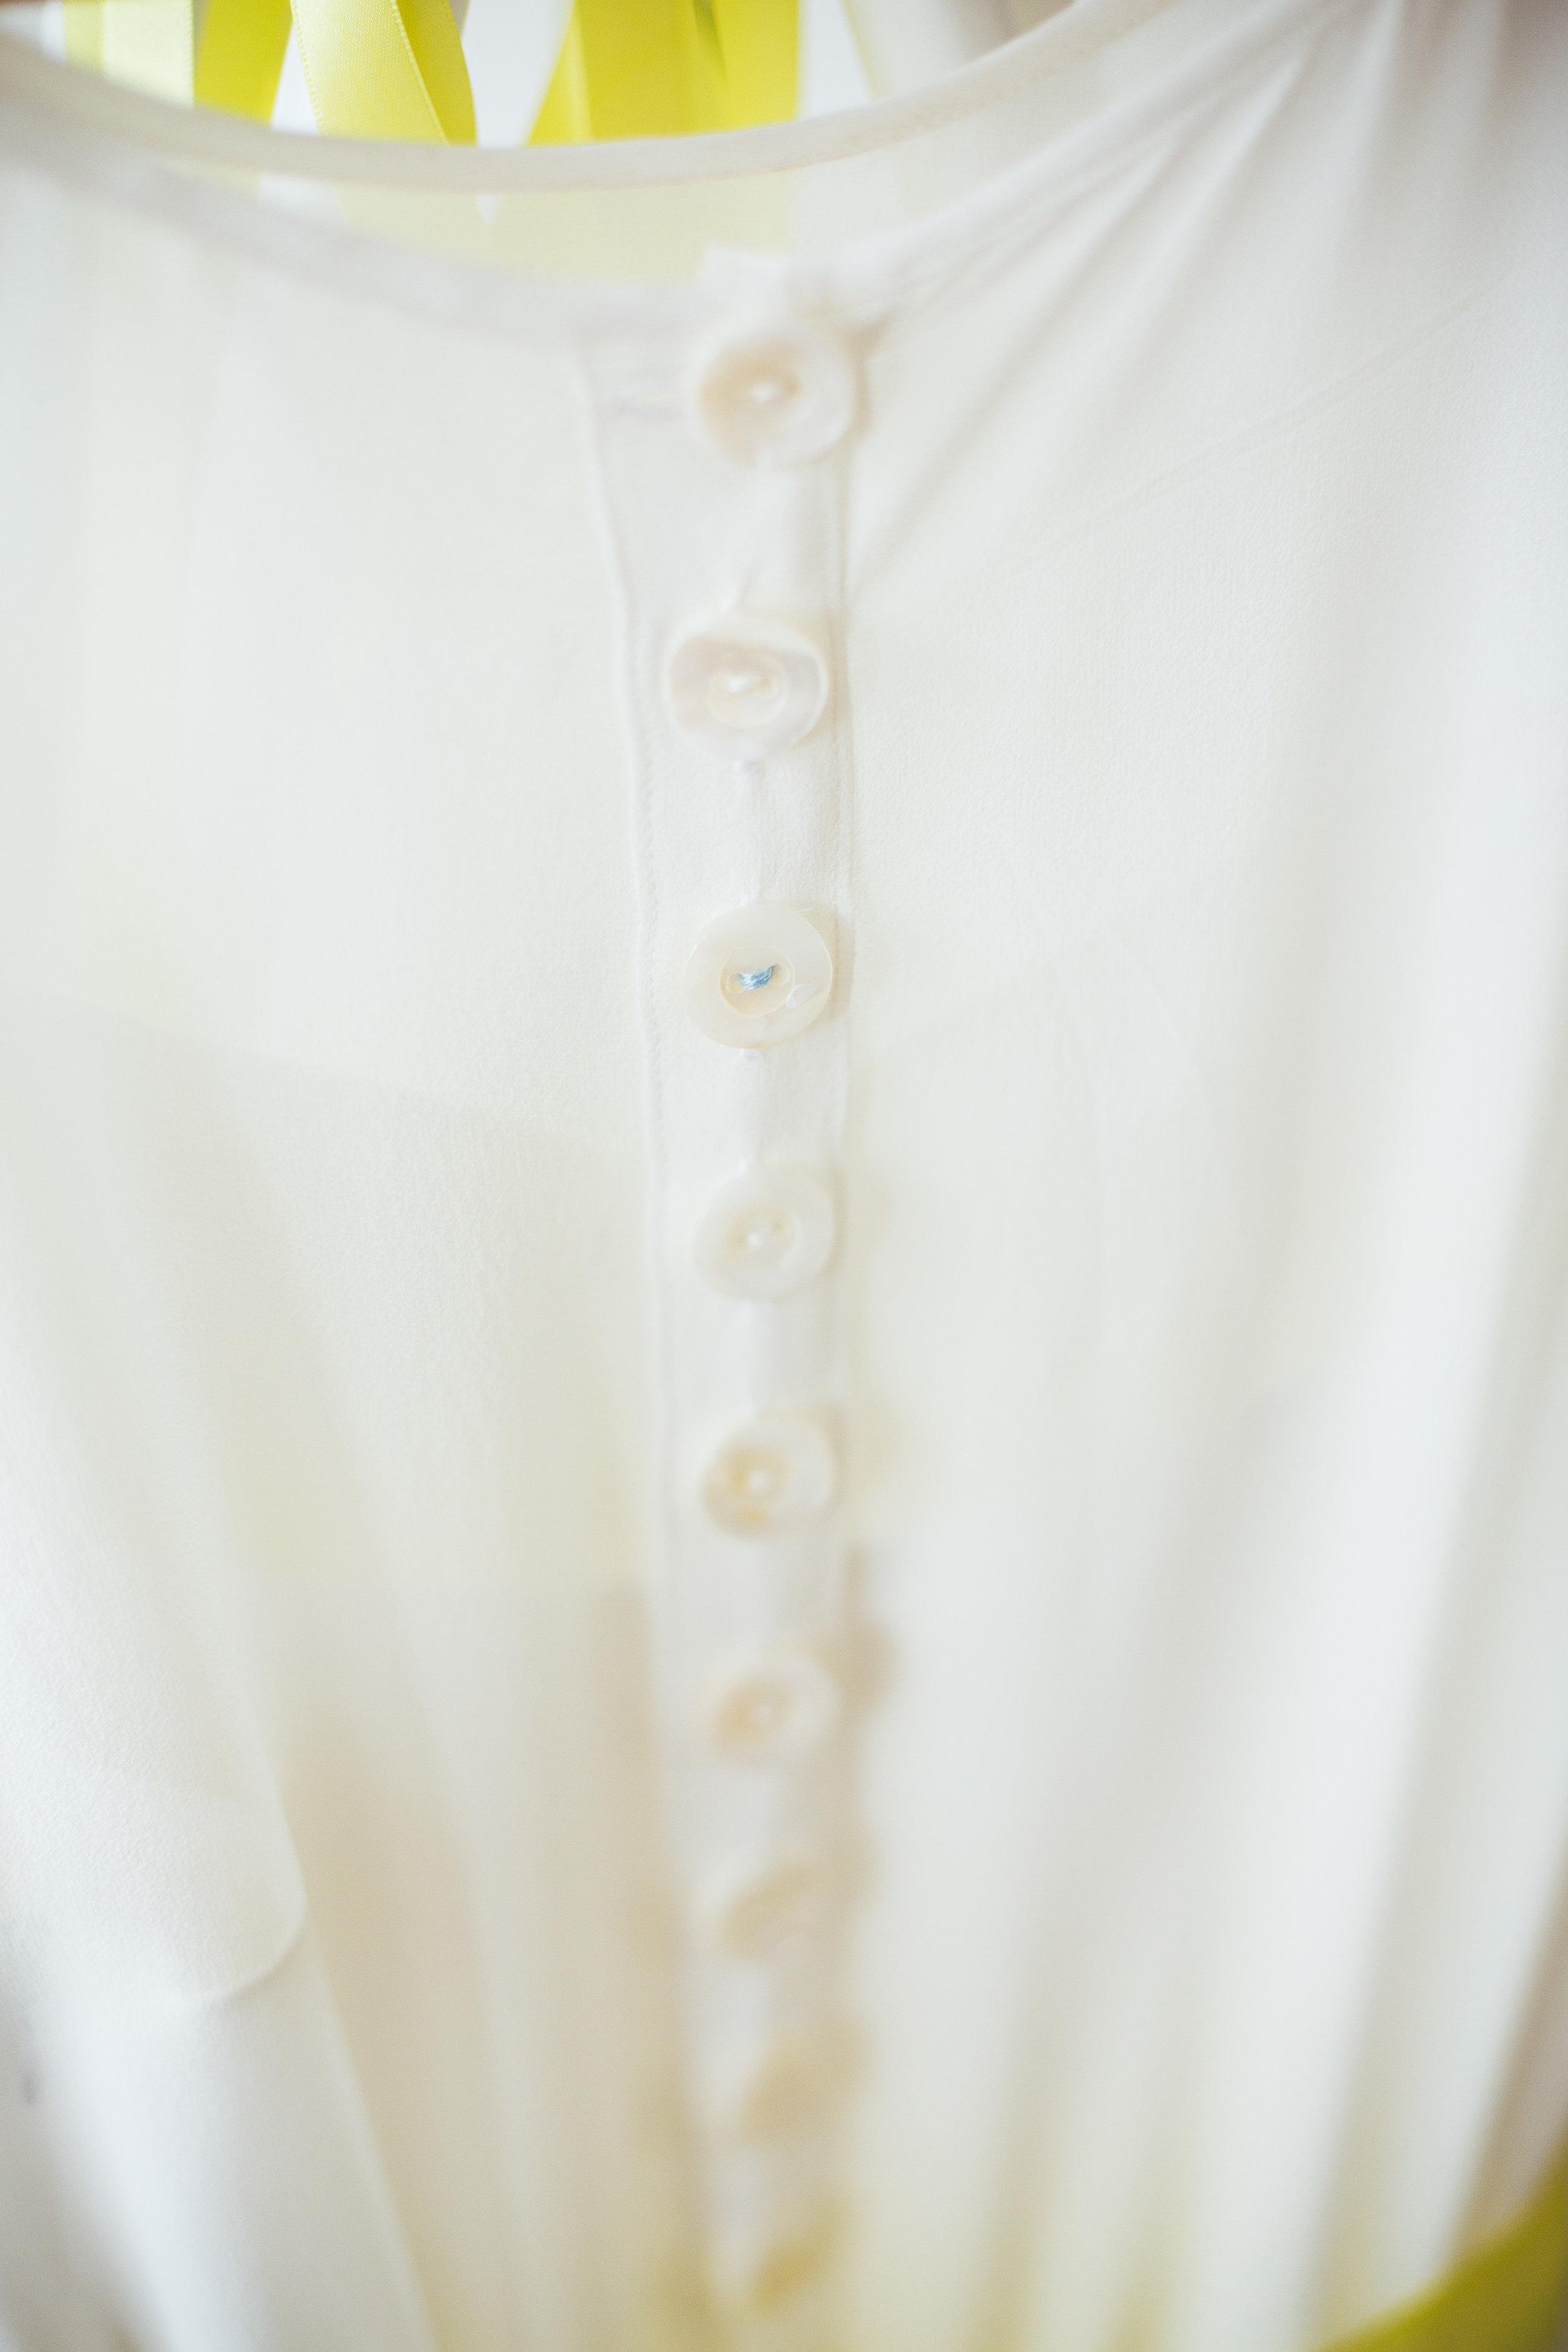 Sophie-Matlock-Bespoke-Vintage-Tea-Length-Wedding-Dress-Susanna-Greening-Derbyshire-12